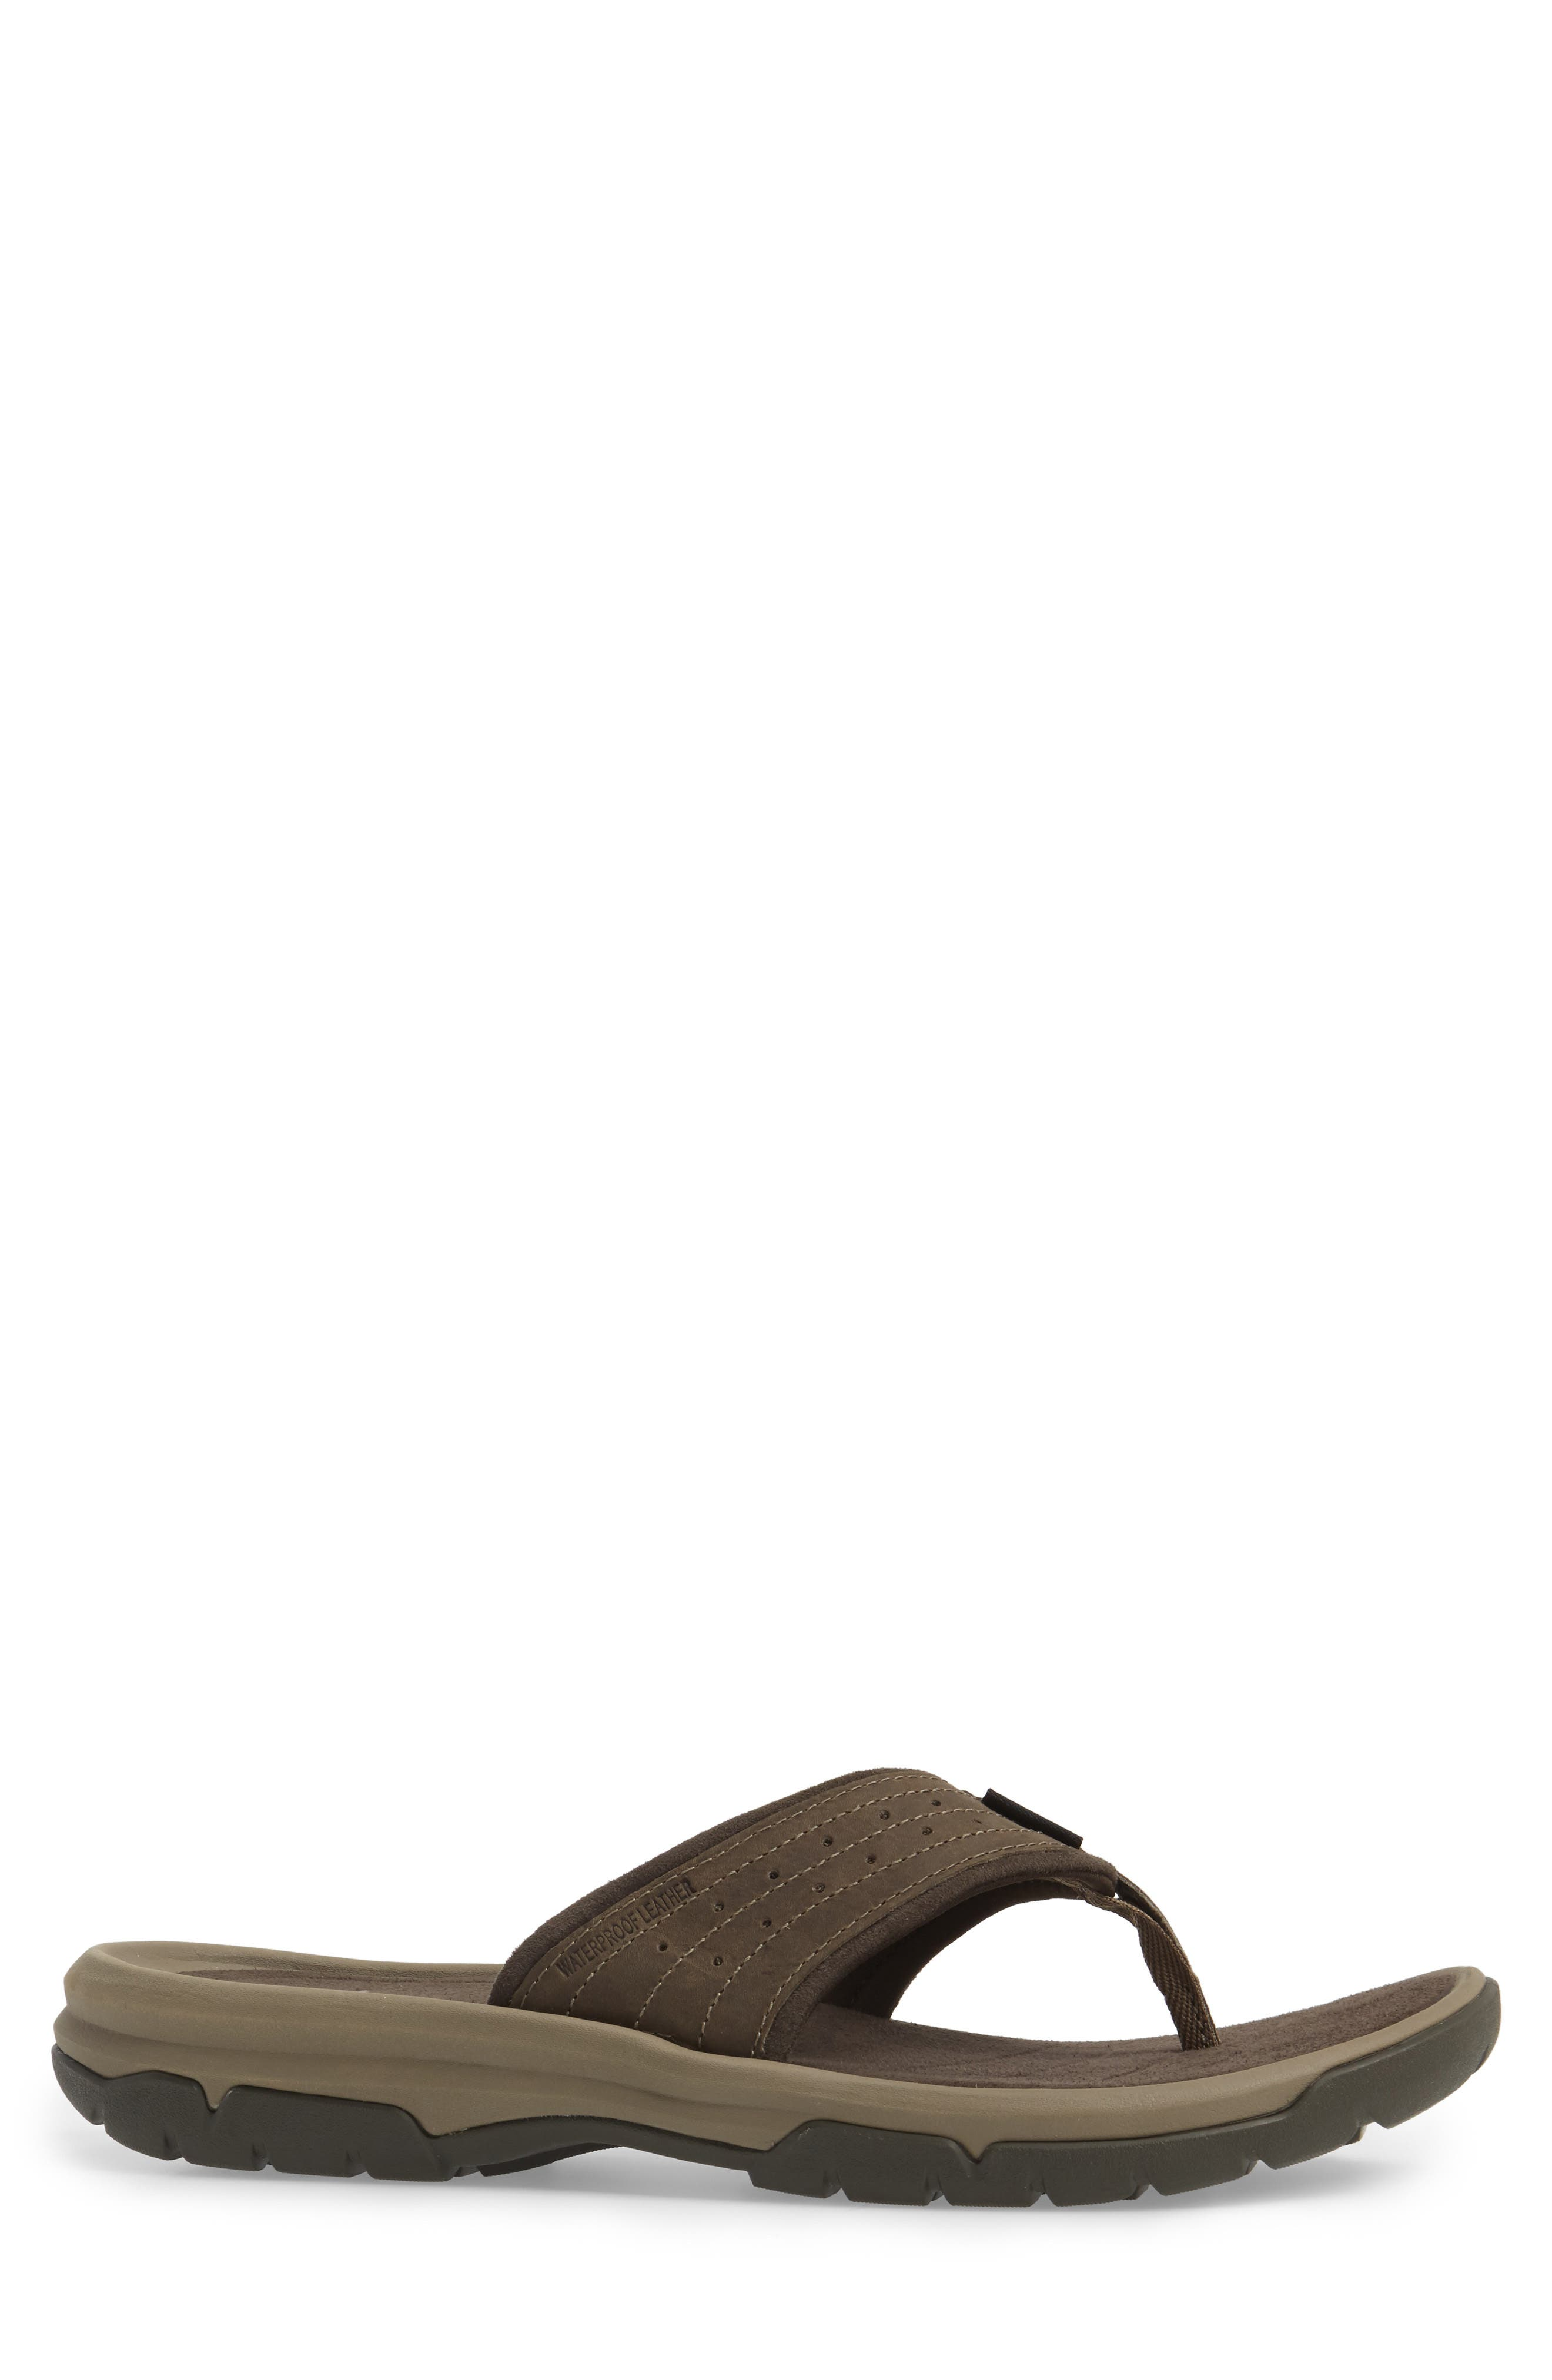 Langdon Flip Flop,                             Alternate thumbnail 3, color,                             Walnut